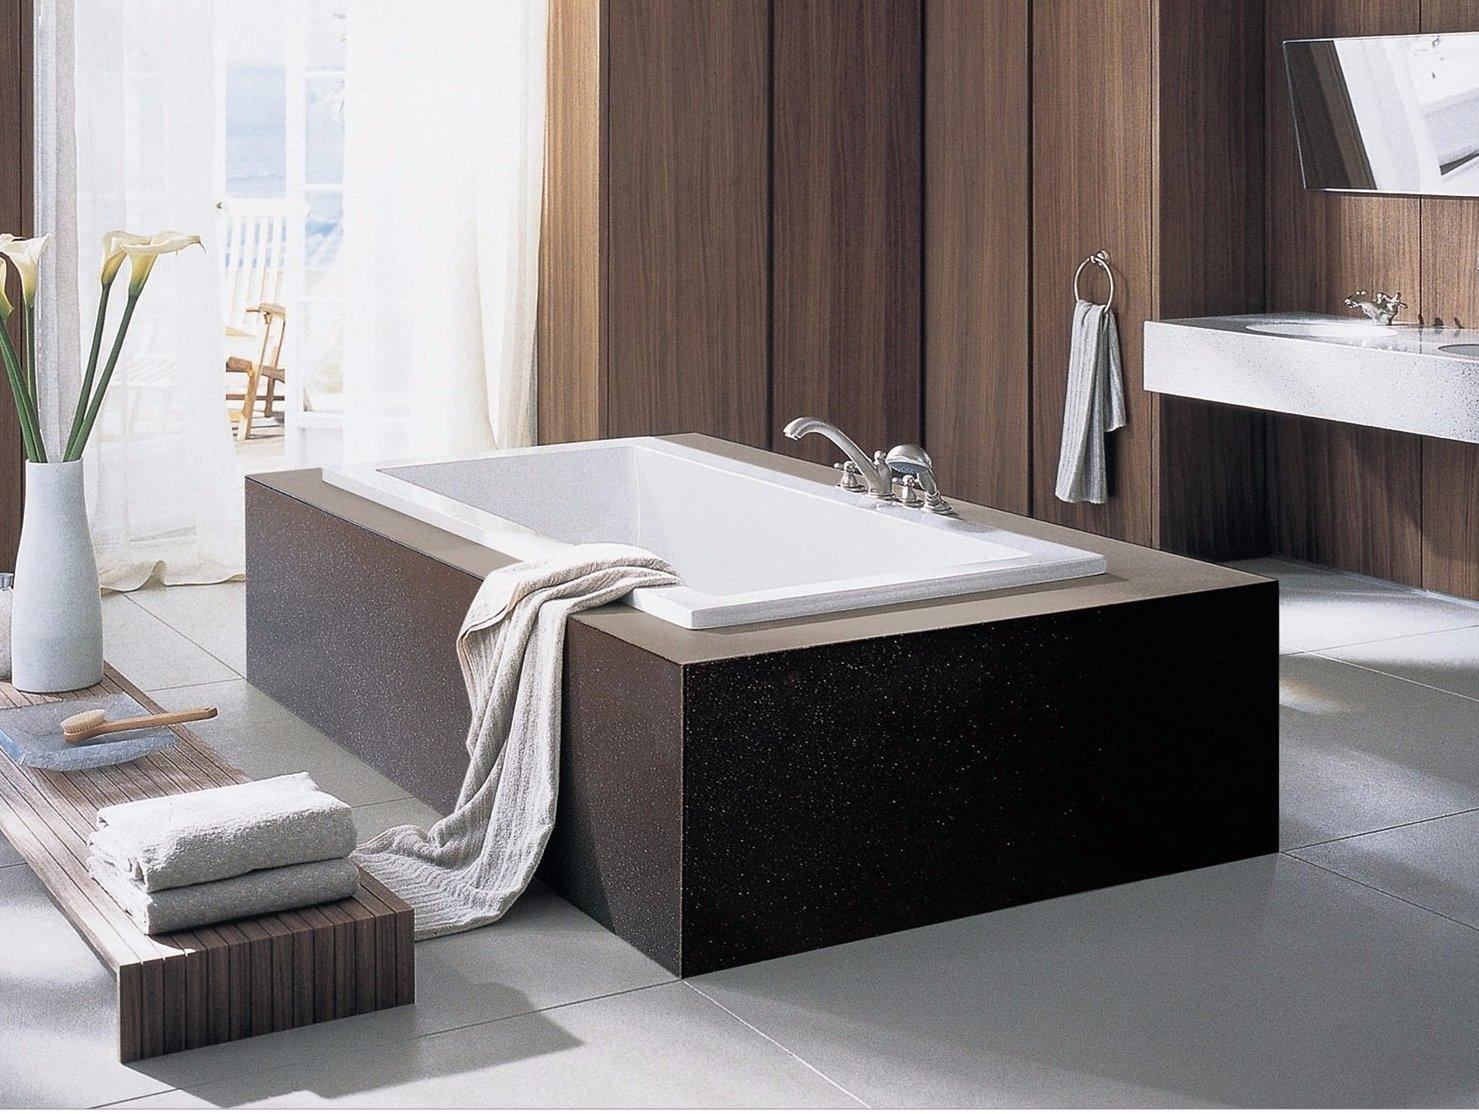 Black colour quartz surface box being made around the bath tub